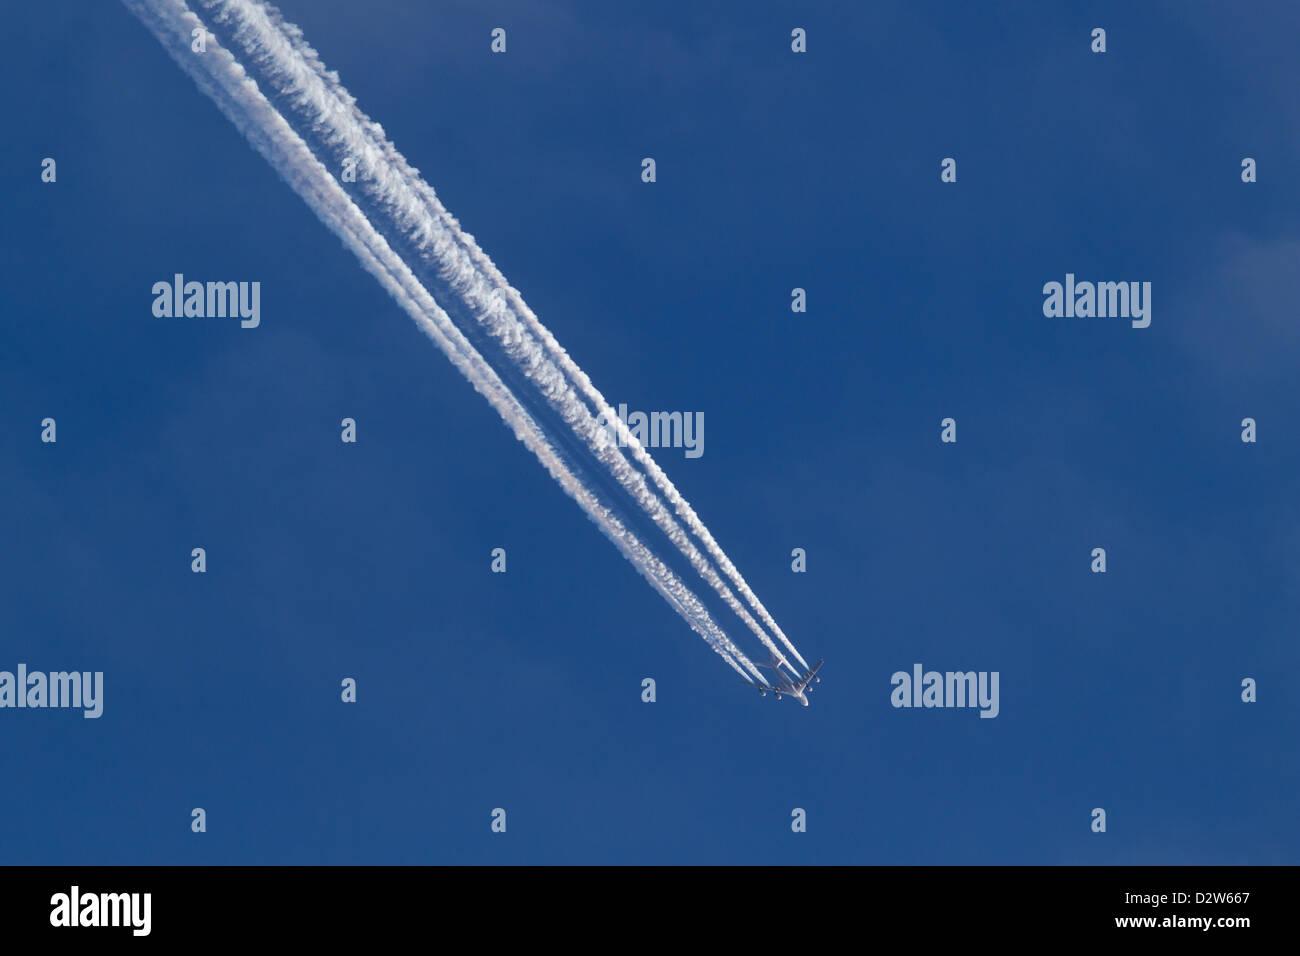 Jet-Flugzeug mit Vapor trails Stockbild